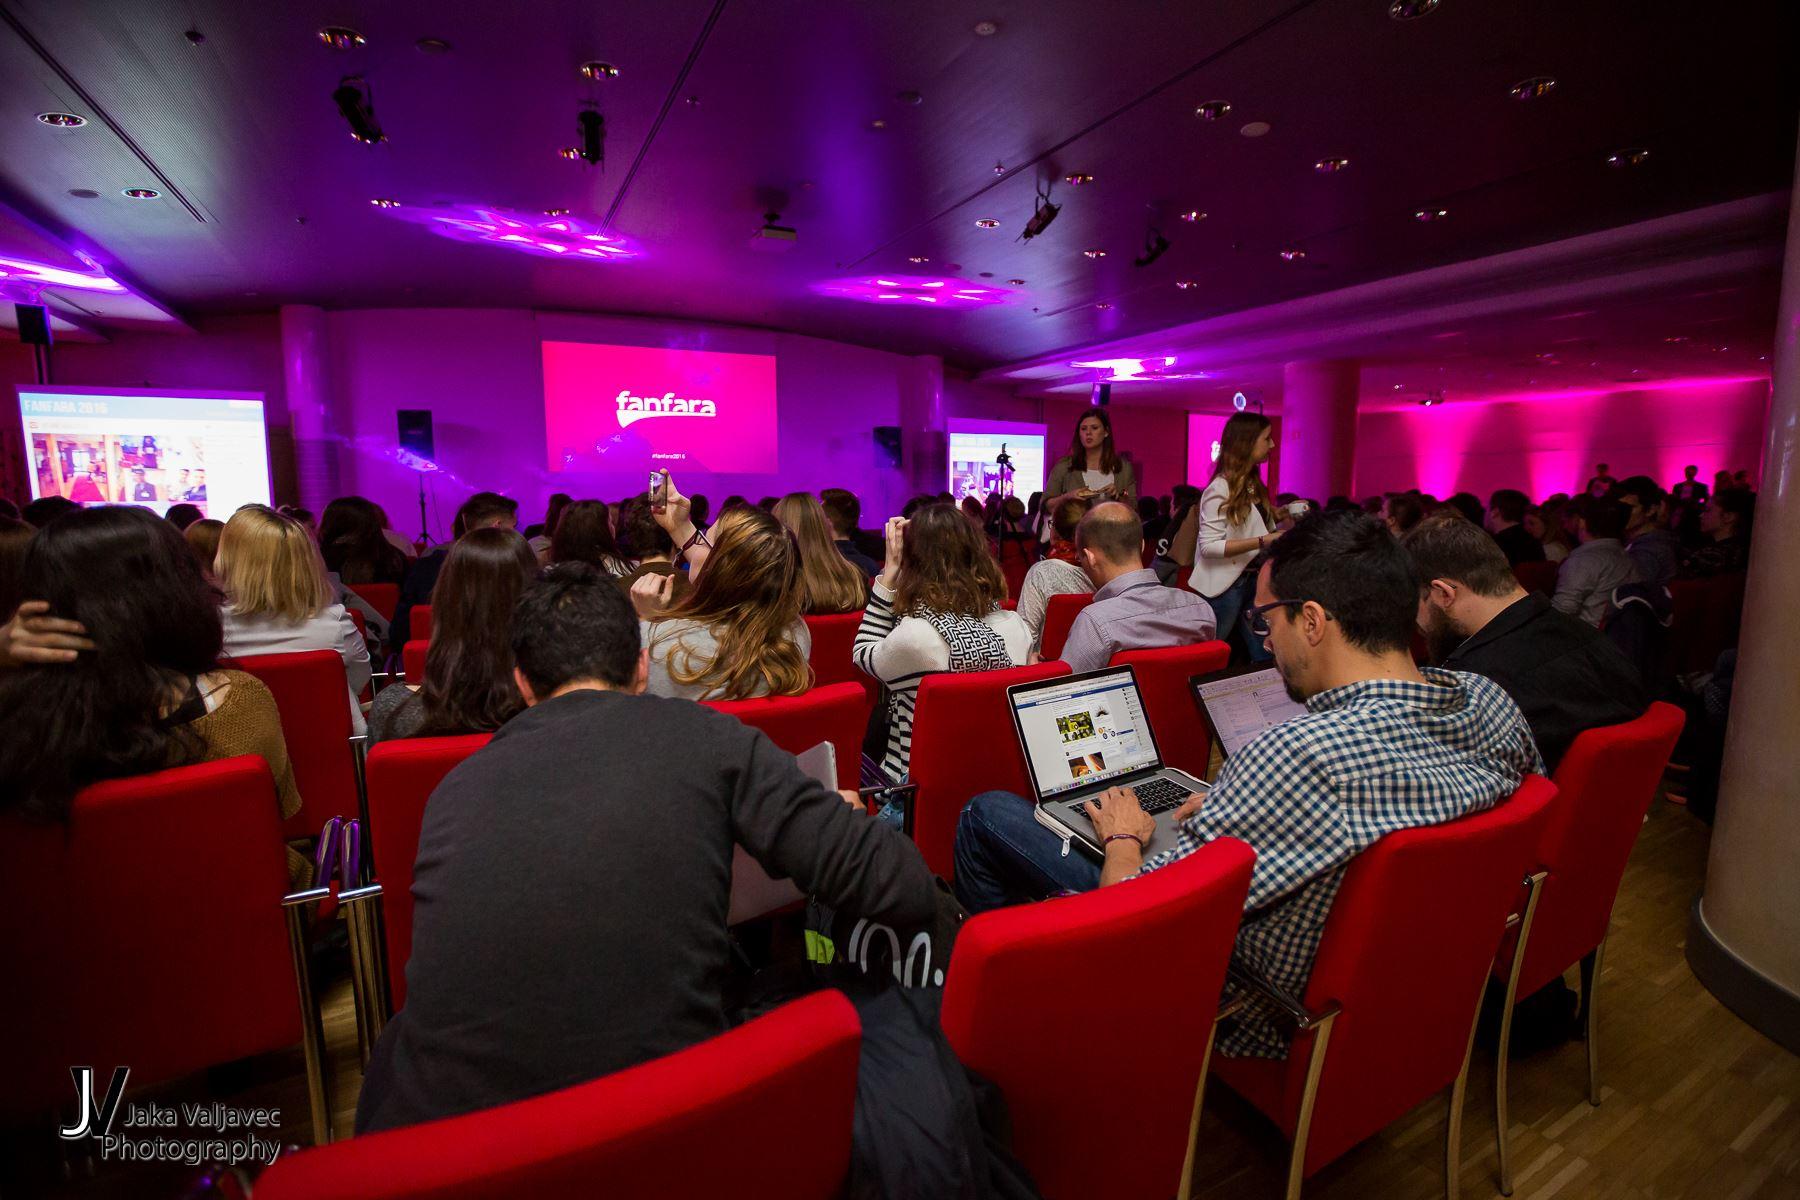 Astria Trend Hotel Ljubljana_Fanfara Conference 2016